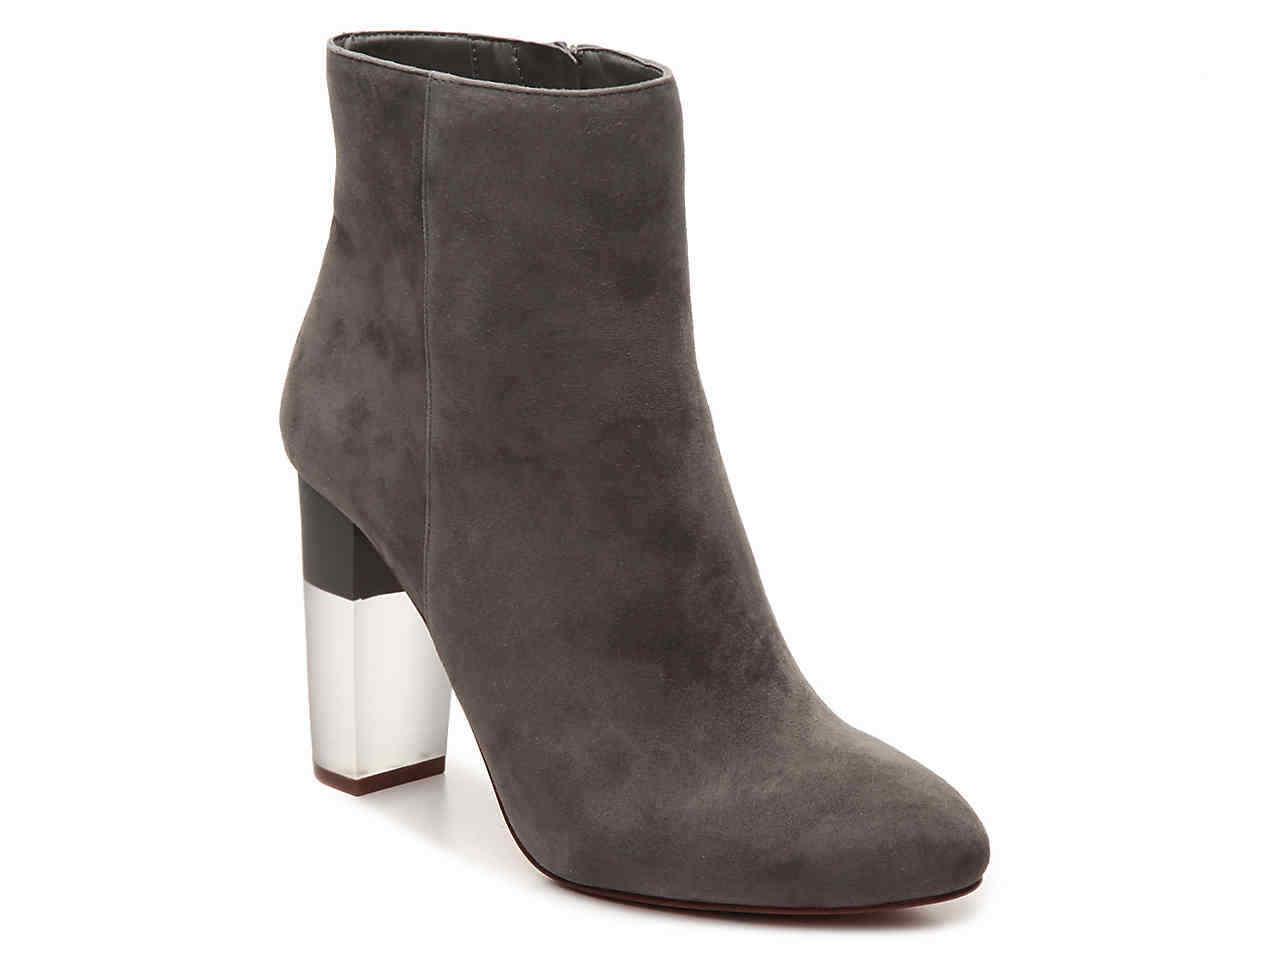 NIB $169 Women's Enzo Angiolini Hadie Bootie - Grey Suede - size 6.5